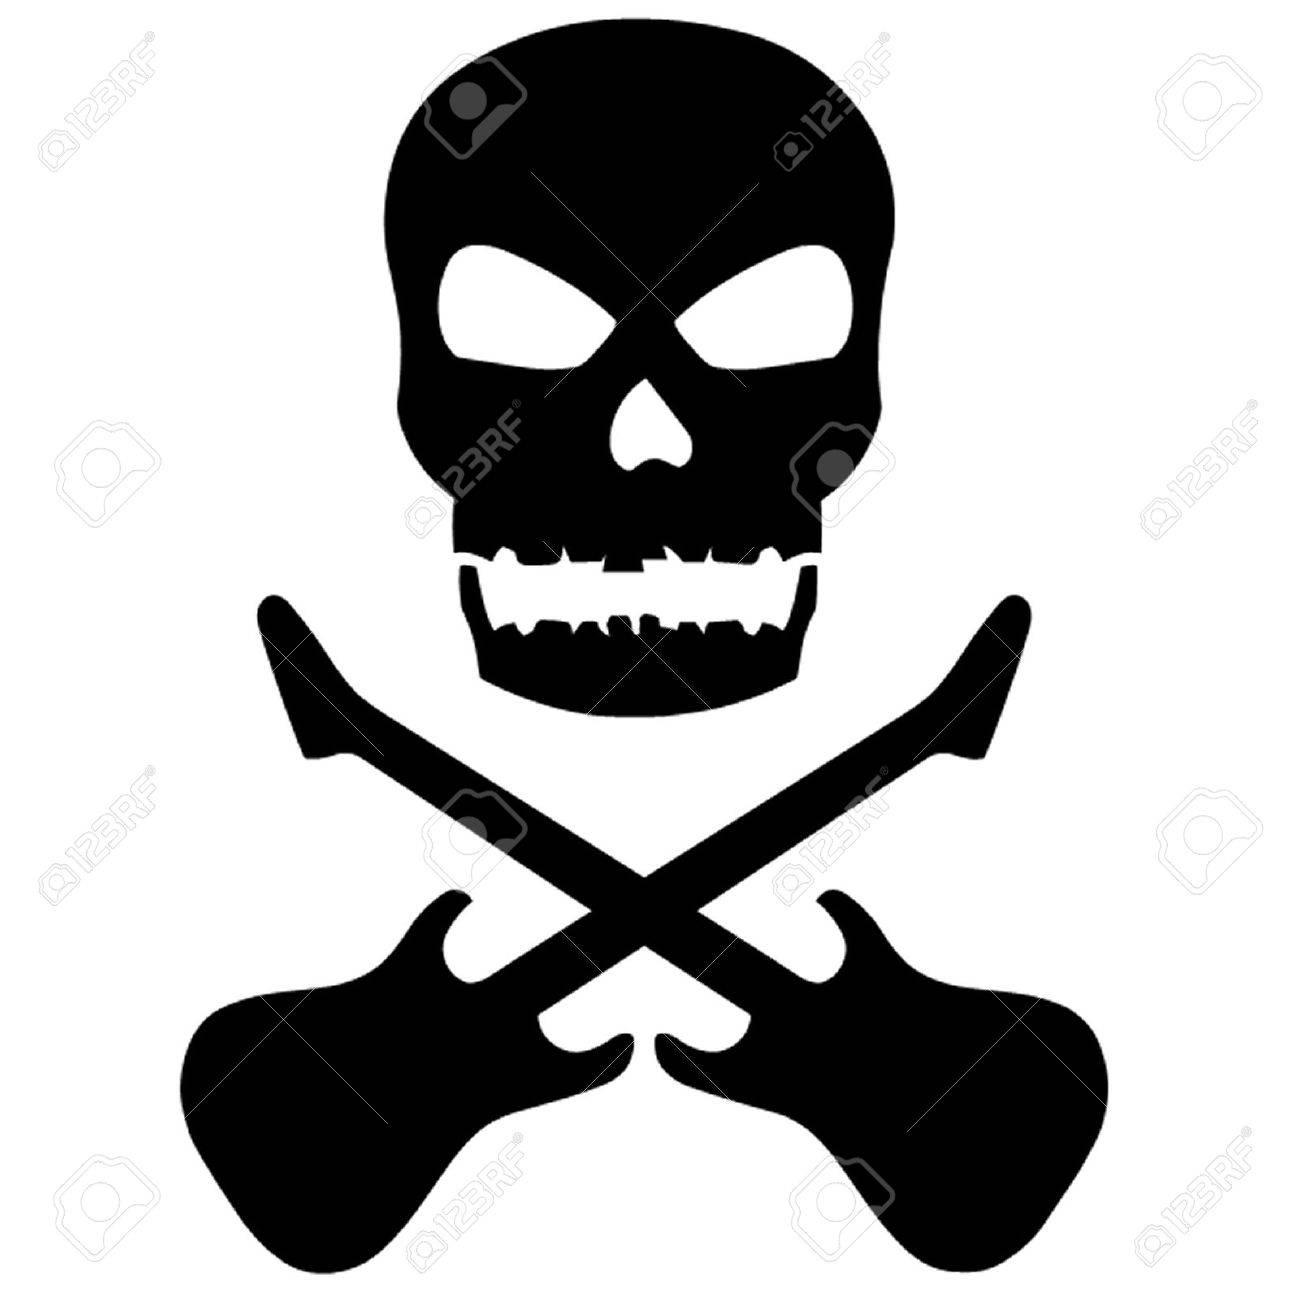 Skull And Crossed Guitars Stock Vector - 15492889